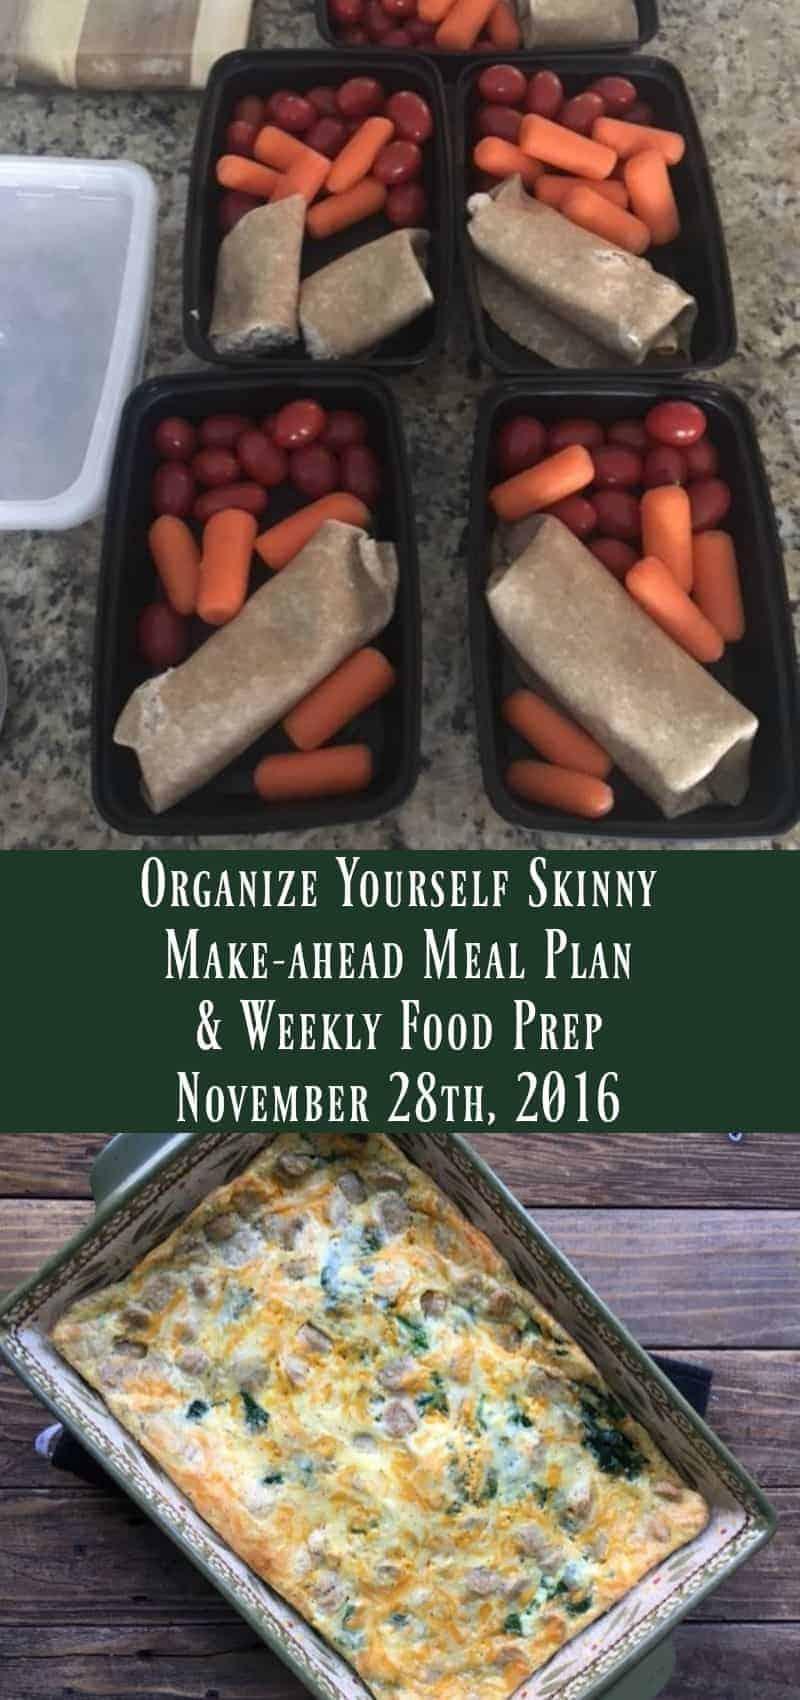 Make-ahead Meal Plan and Weekly Food Prep {November 28th, 2016}